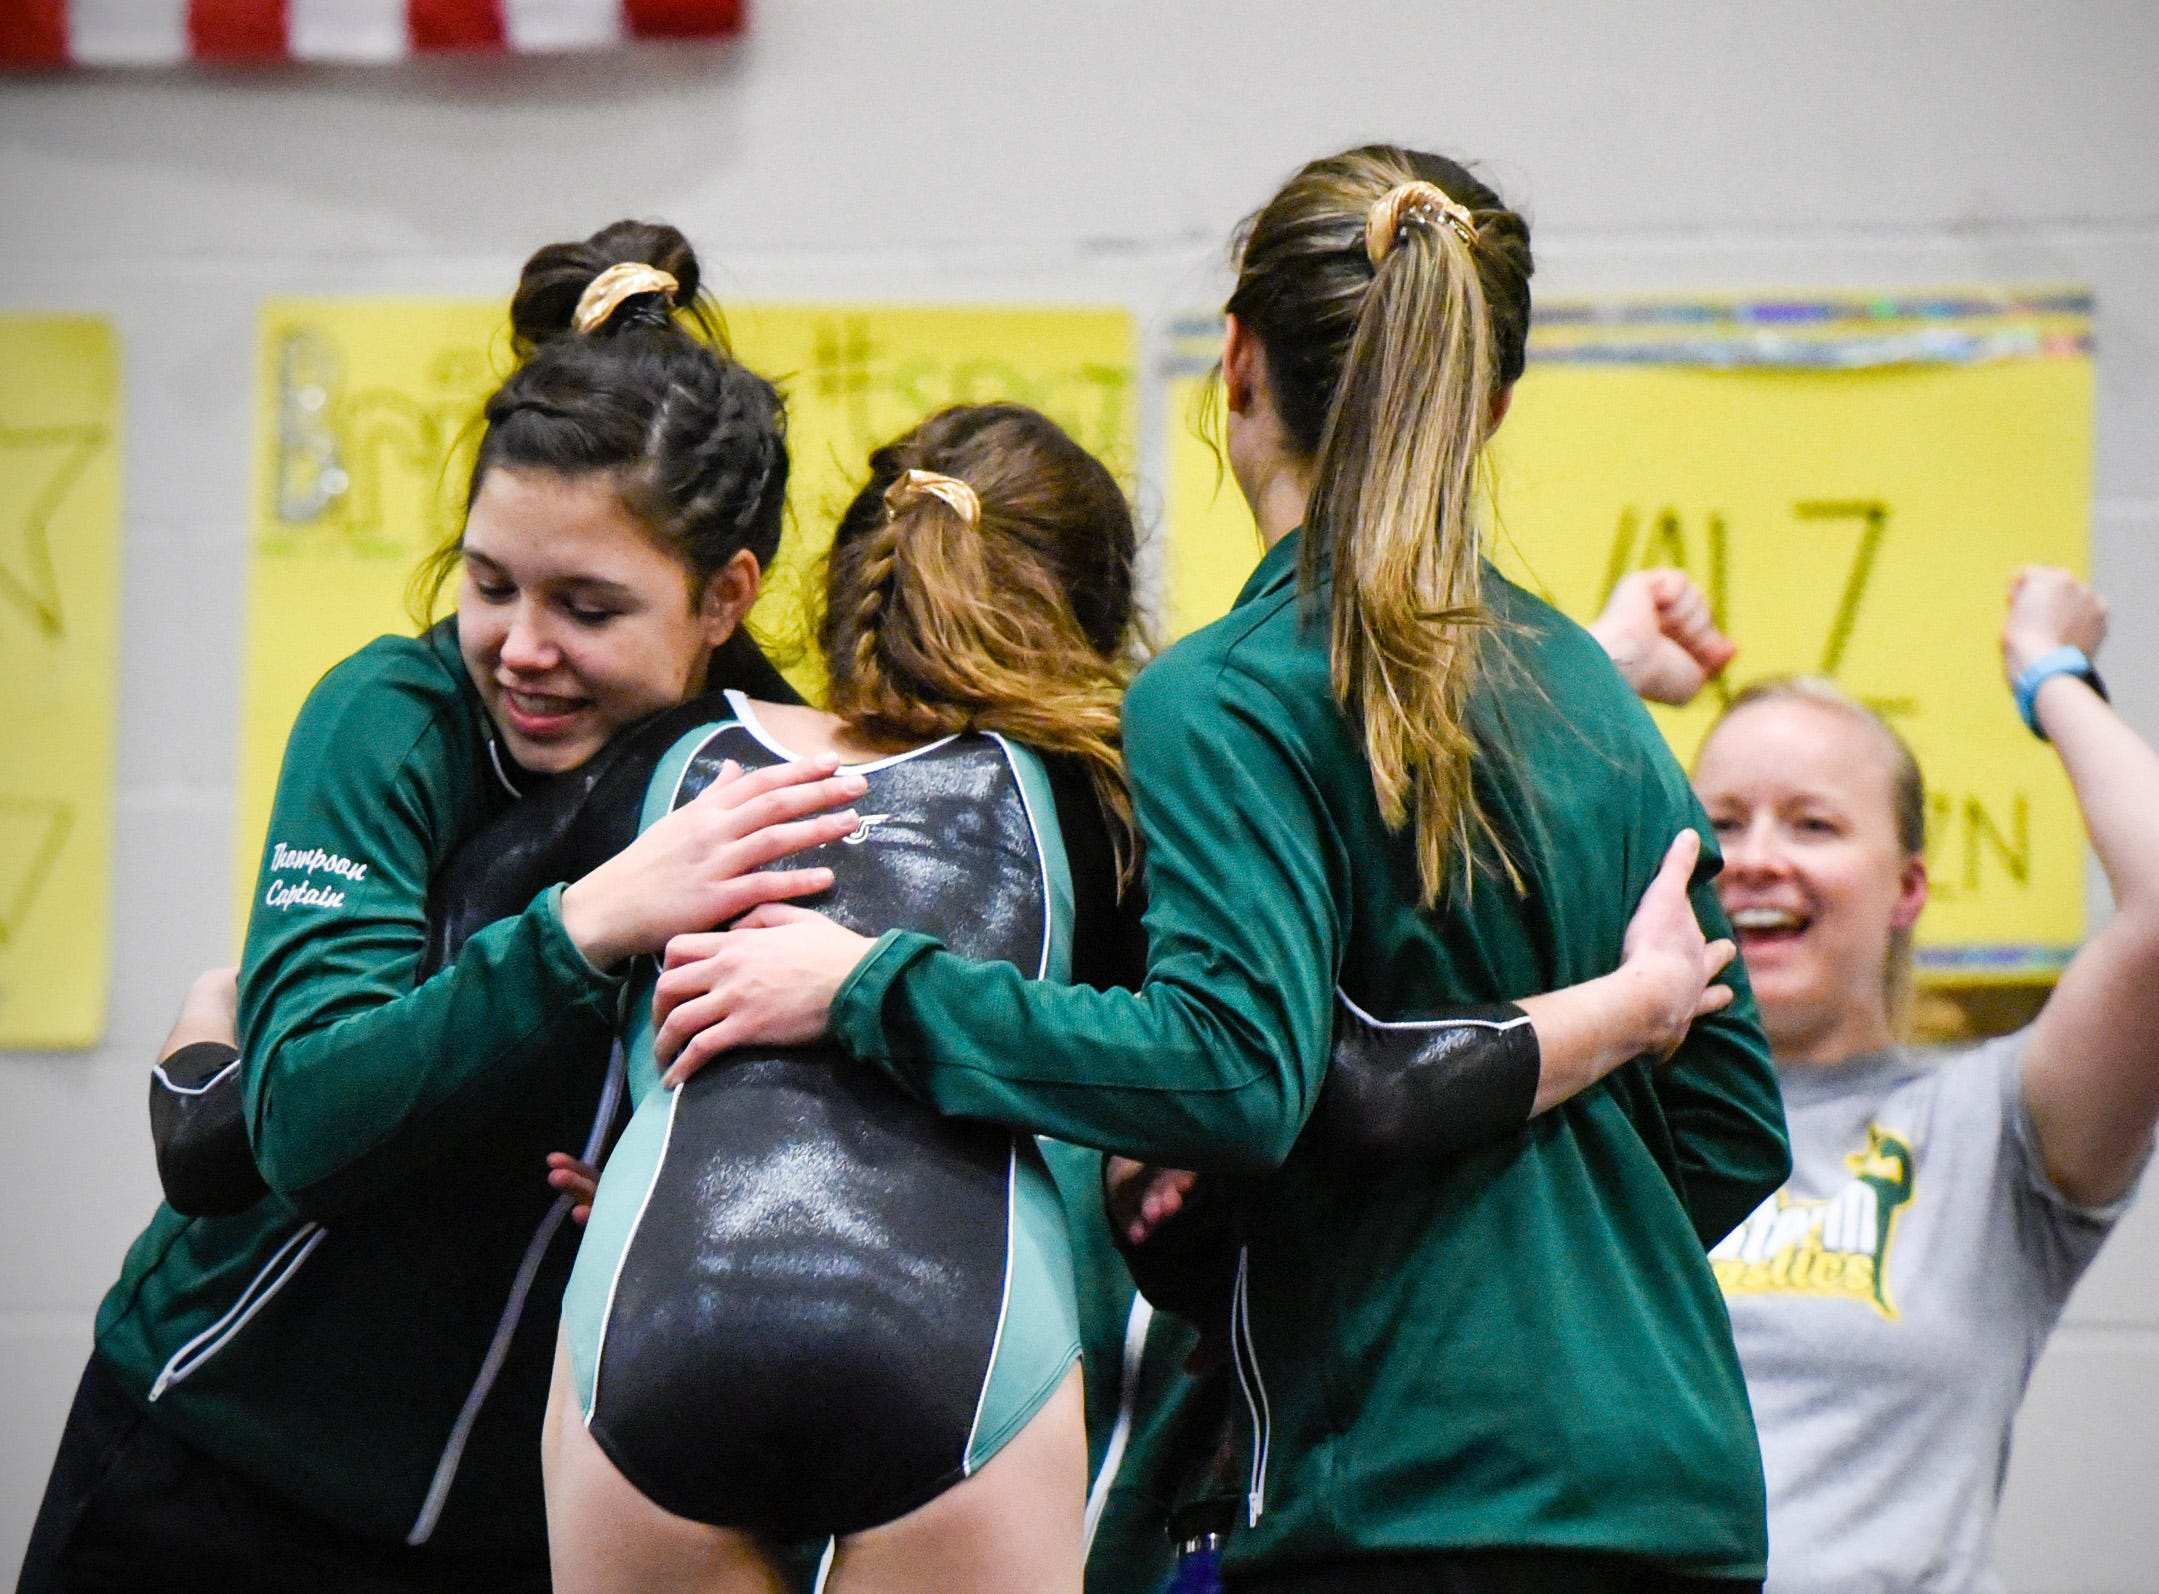 Sauk Rapids' Justus Floren is met by teammates after her floor routine Thursday, Jan. 3, at the Sauk Rapids-Rice High School.